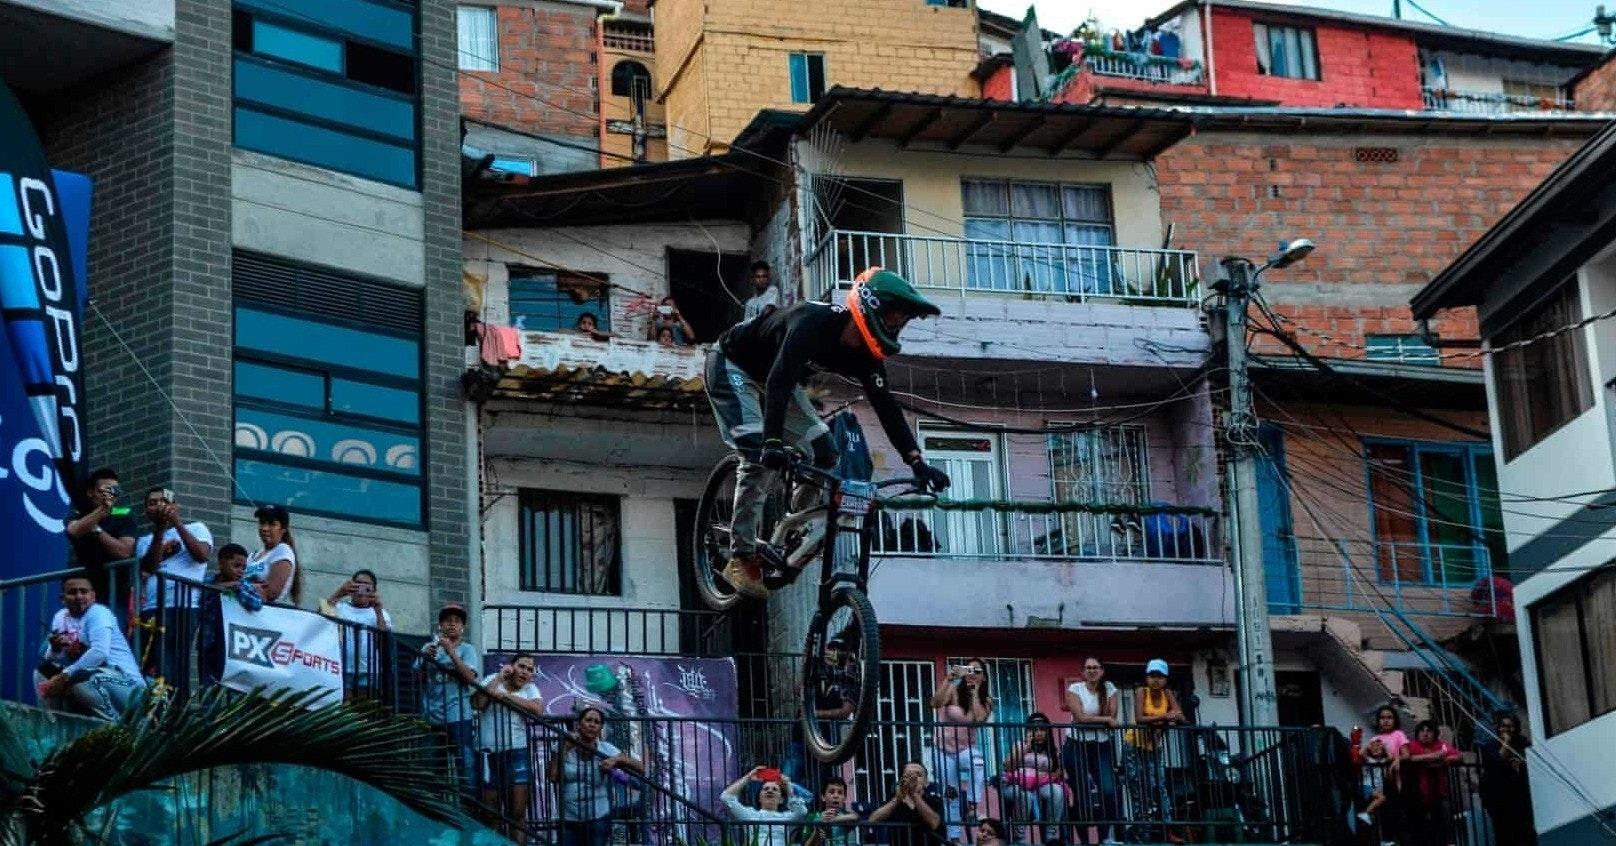 Mountain bike, Medellín, Downhill mountain biking, Bicycle, Mountain biker, 2018–19 Premier League, Manchester United F.C., Mountain biking, Cycling, Athlete, Mountain bike, town, city, street, tree, building, recreation, facade, house, window